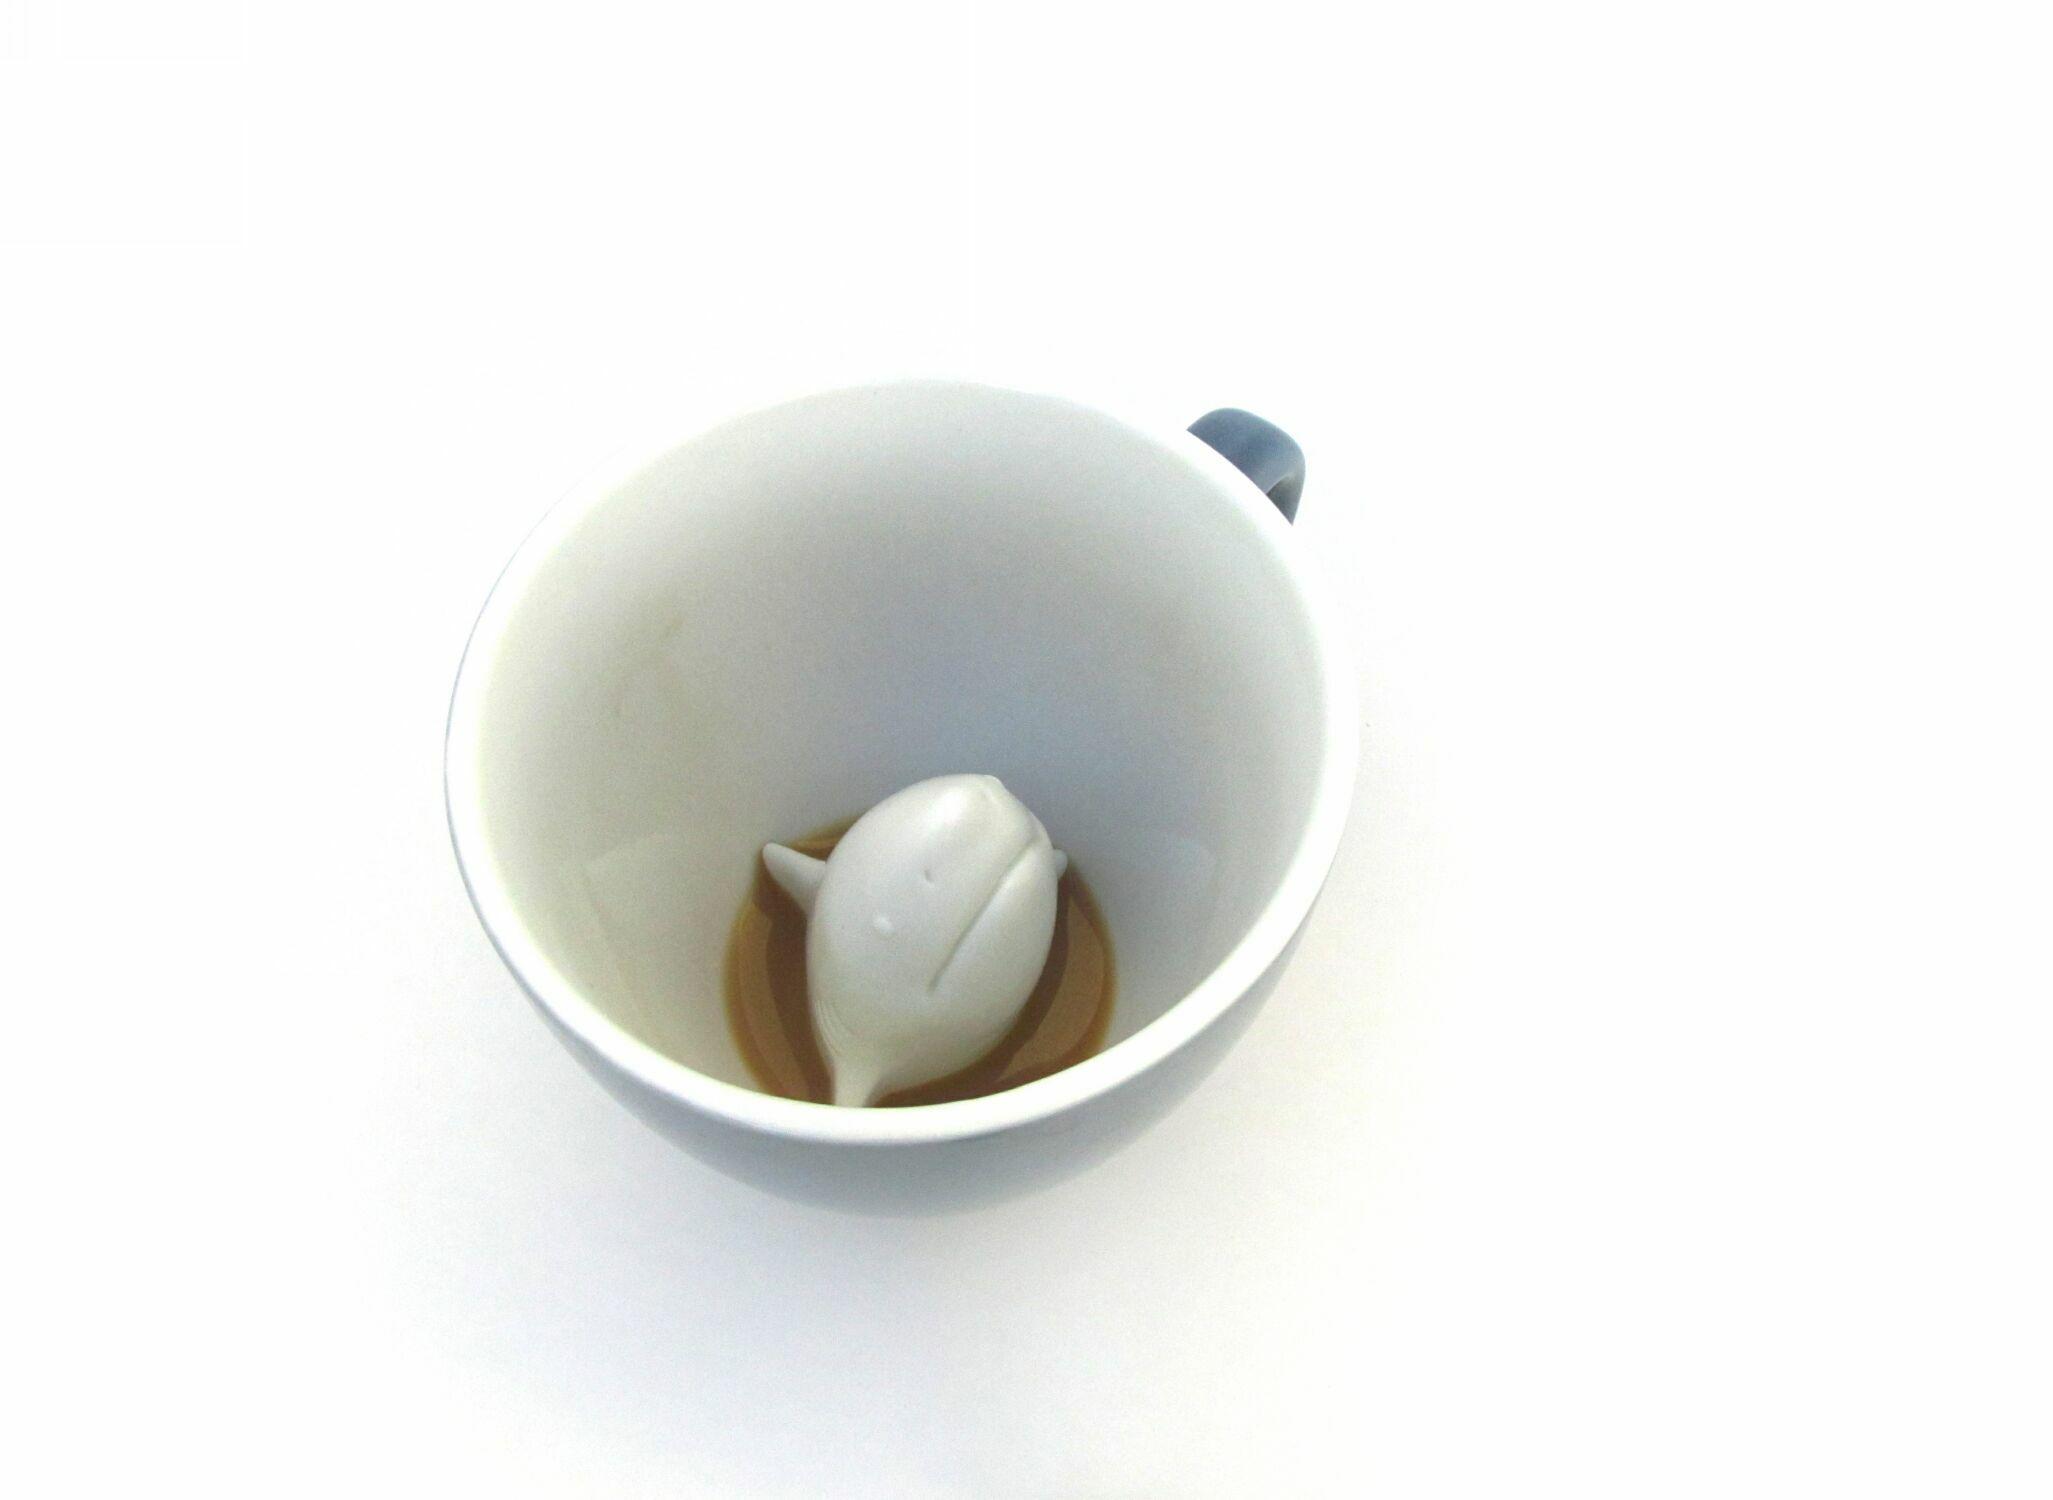 Пинкл (Pinkl) | Кружка с акулой 330мл | Creature Cups SharkCup 11oz